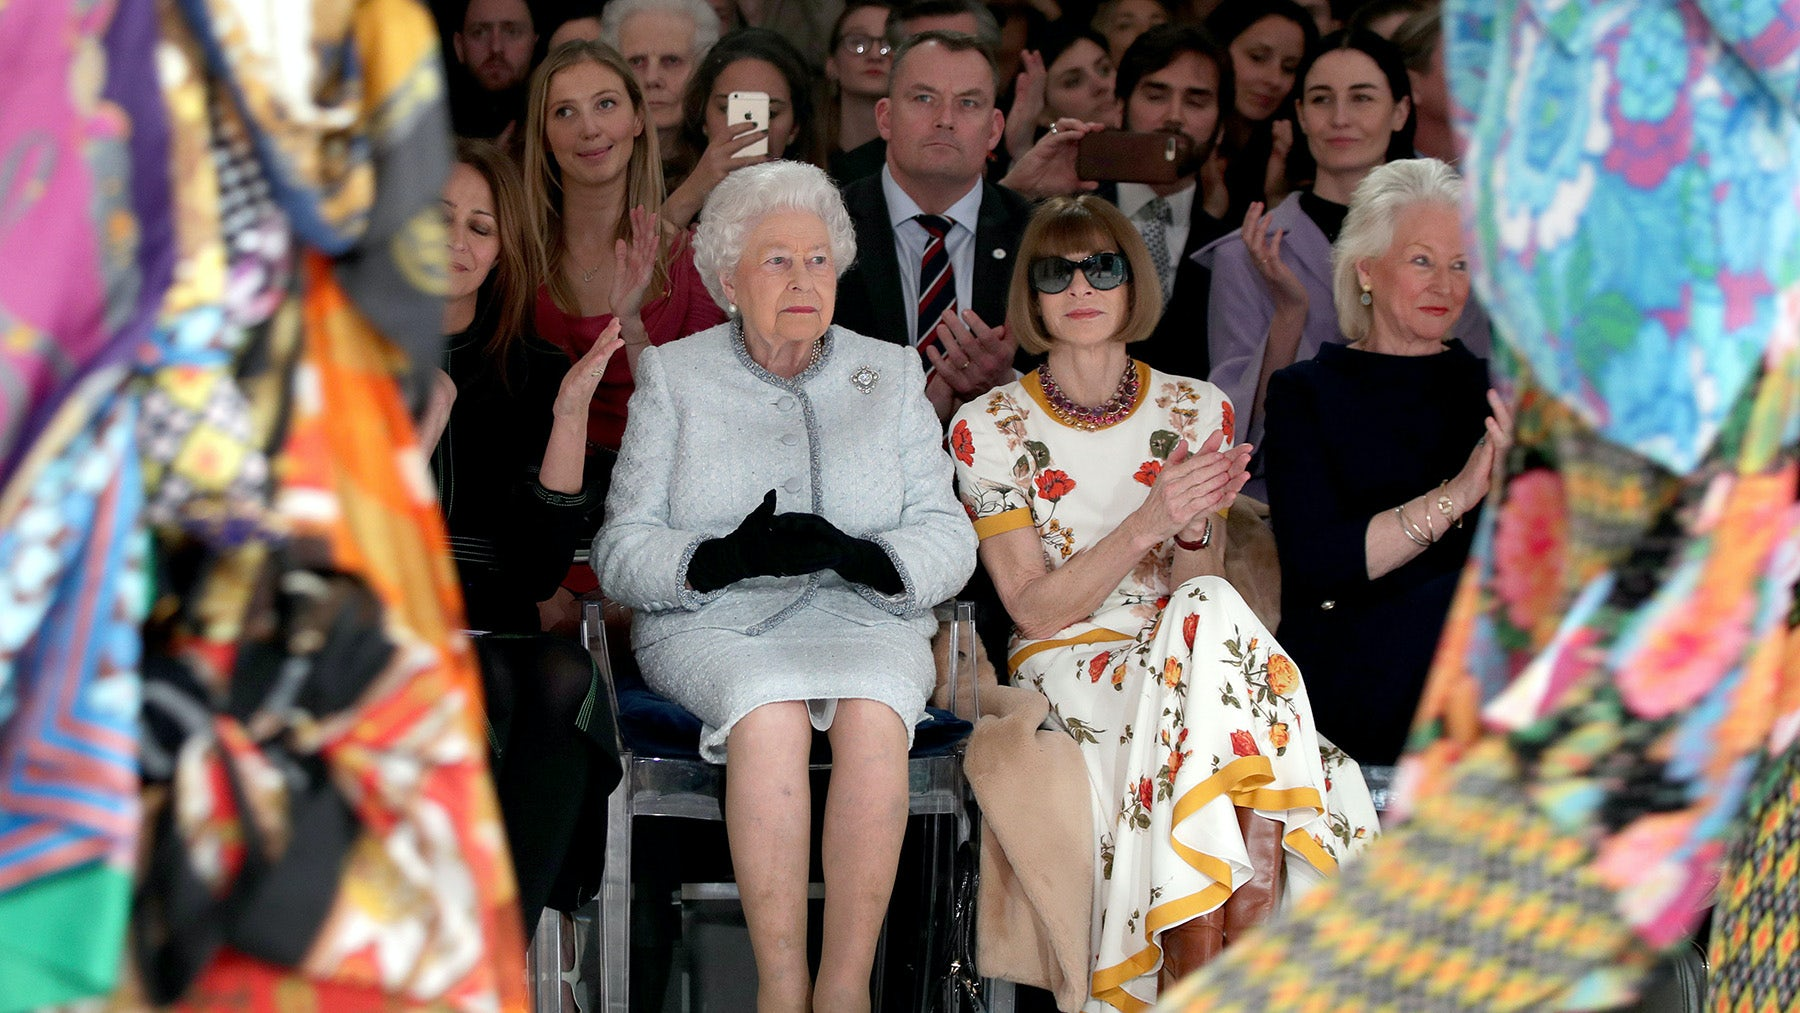 Queen Elizabeth II and Anna Wintour at Richard Quinn's Autumn/Winter 2018 show | Source: Yui Mok/AFP/Getty